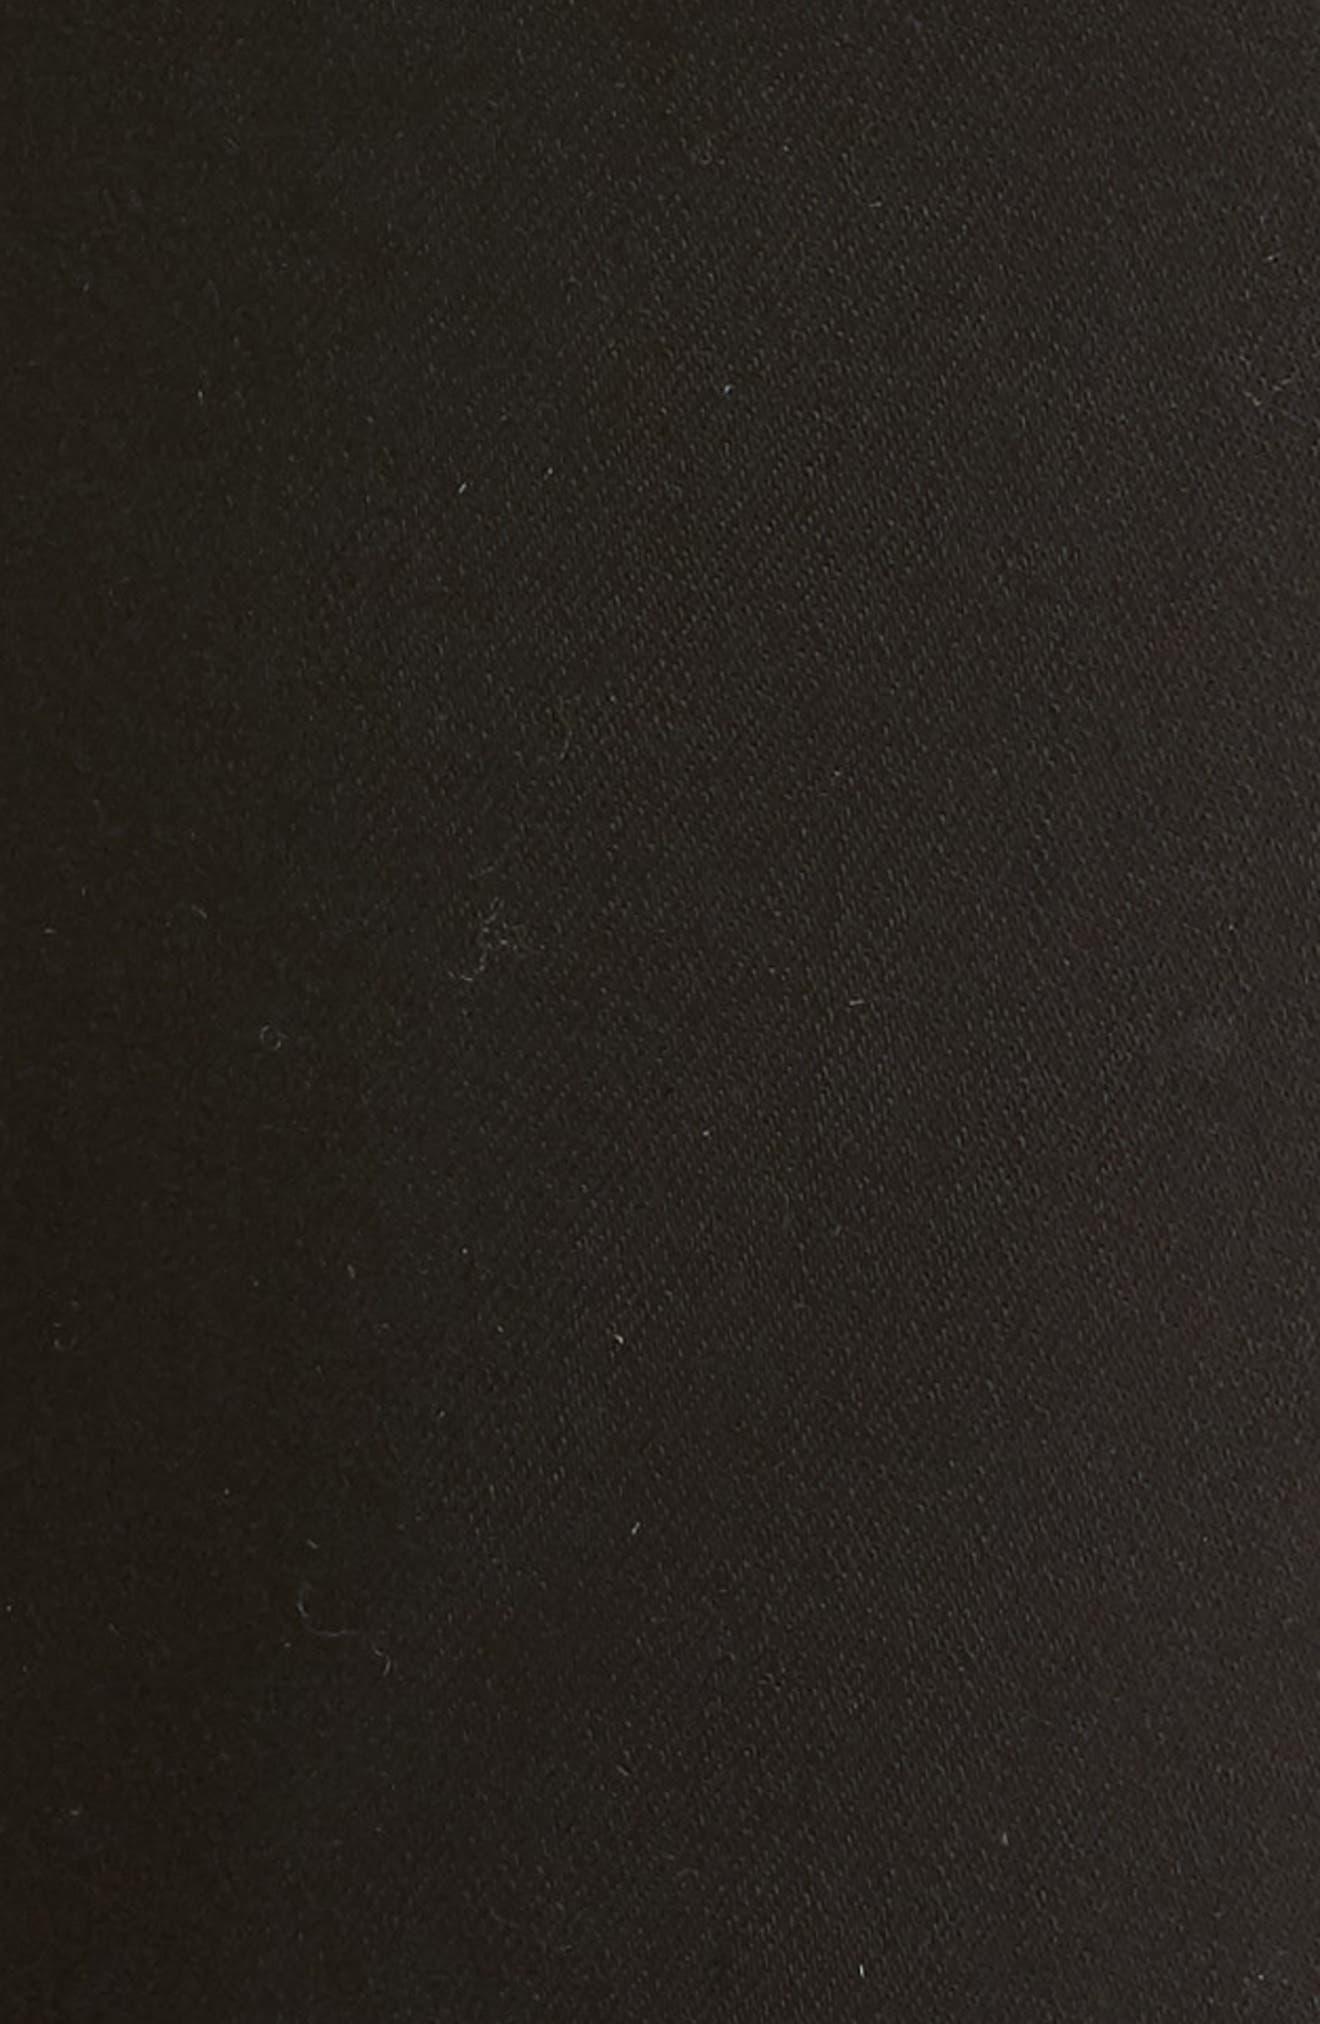 Rocket Skinny Jeans,                             Alternate thumbnail 6, color,                             Blackbird